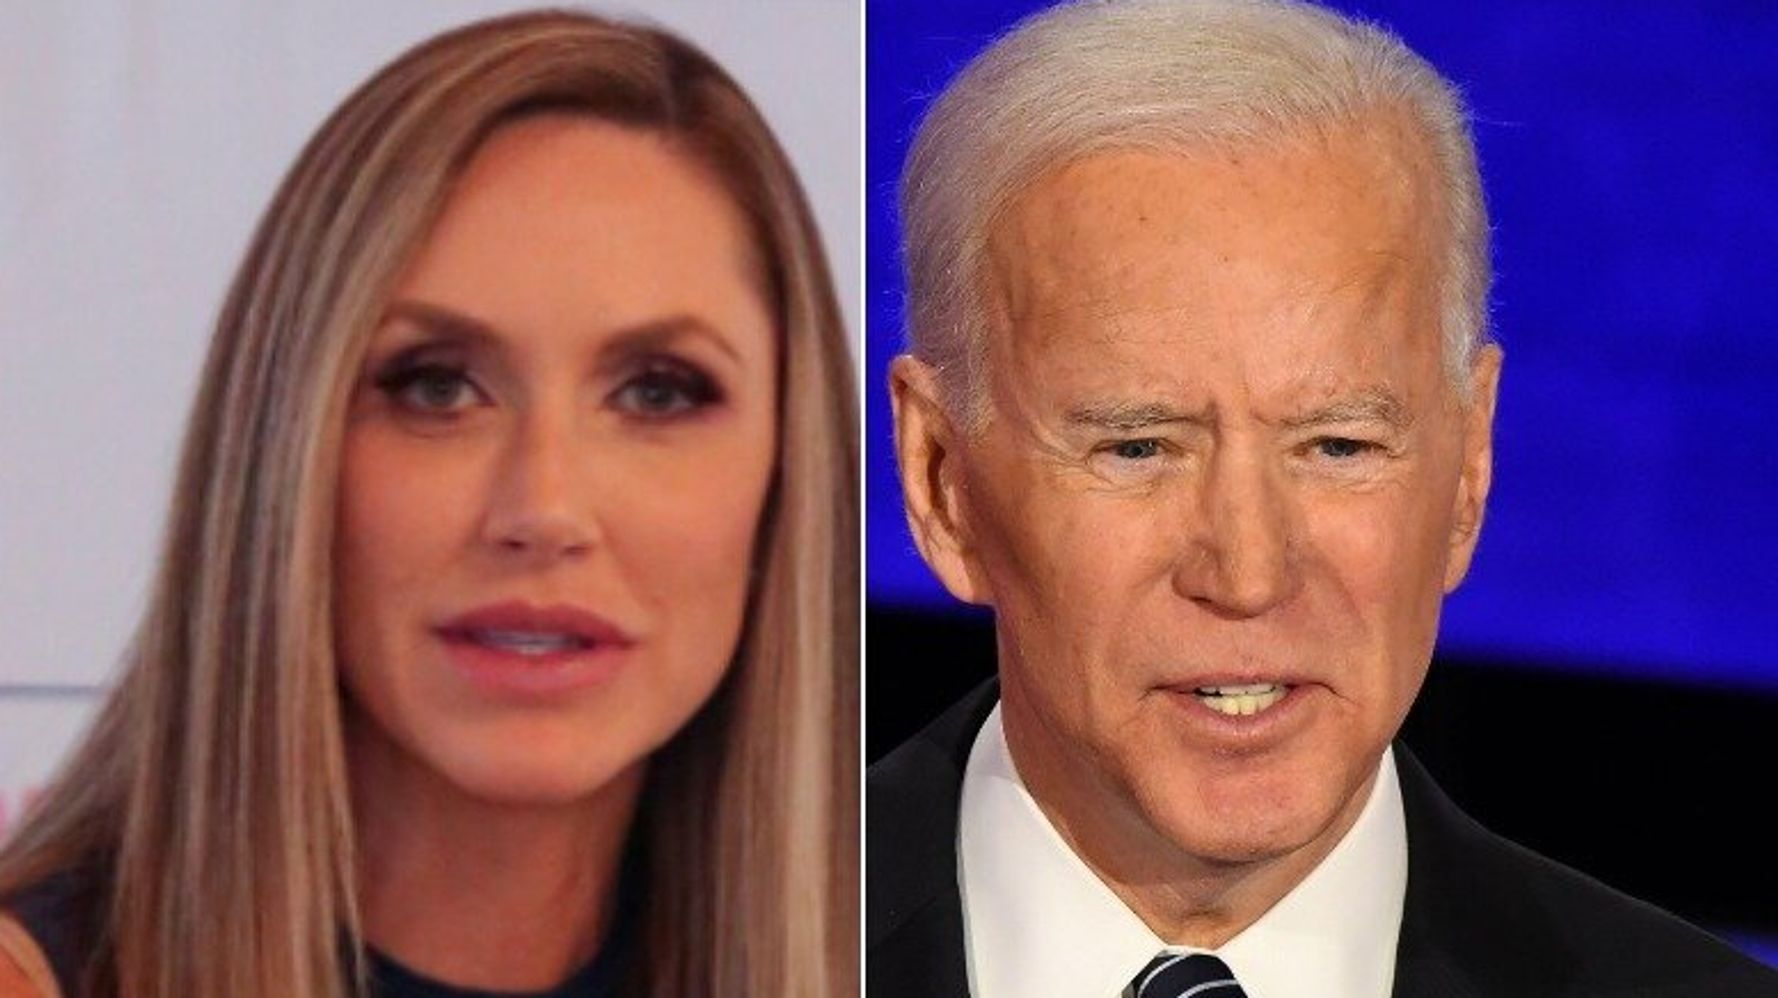 Westlake Legal Group 5e214edc24000051006c431f 'Let's Get The Words Out': Lara Trump Taunts Joe Biden Over Stutter